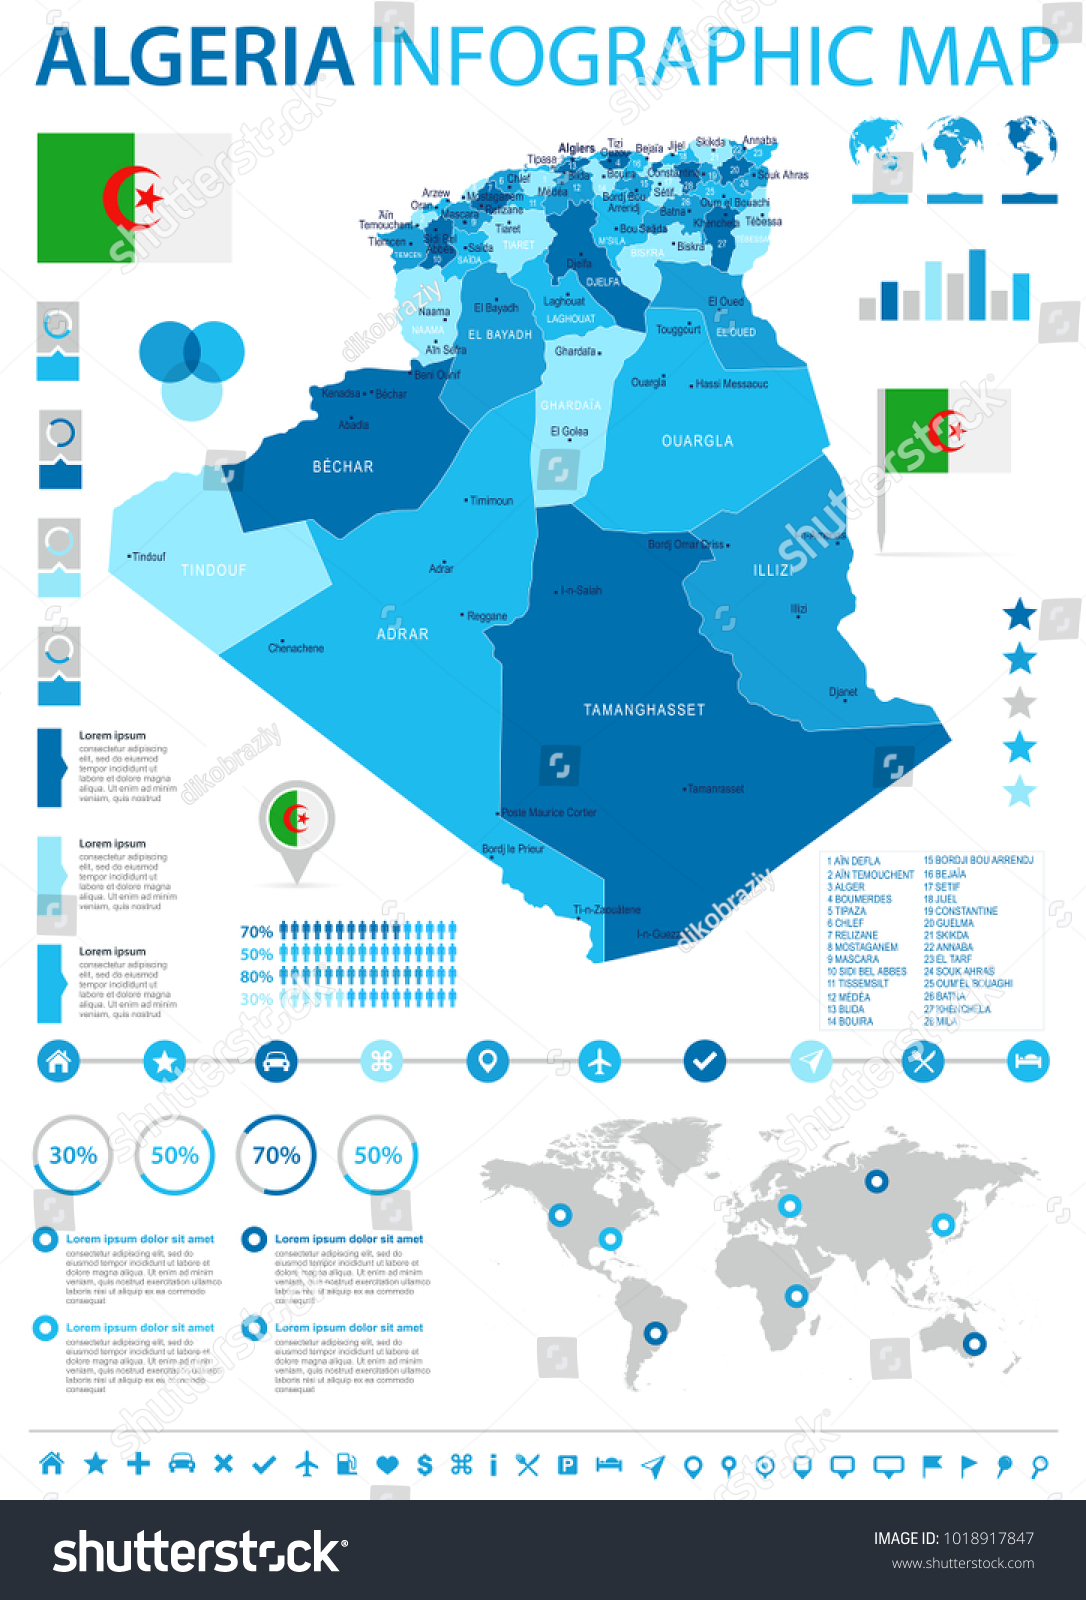 Algeria Infographic Map Flag High Detailed Stock Vector 1018917847